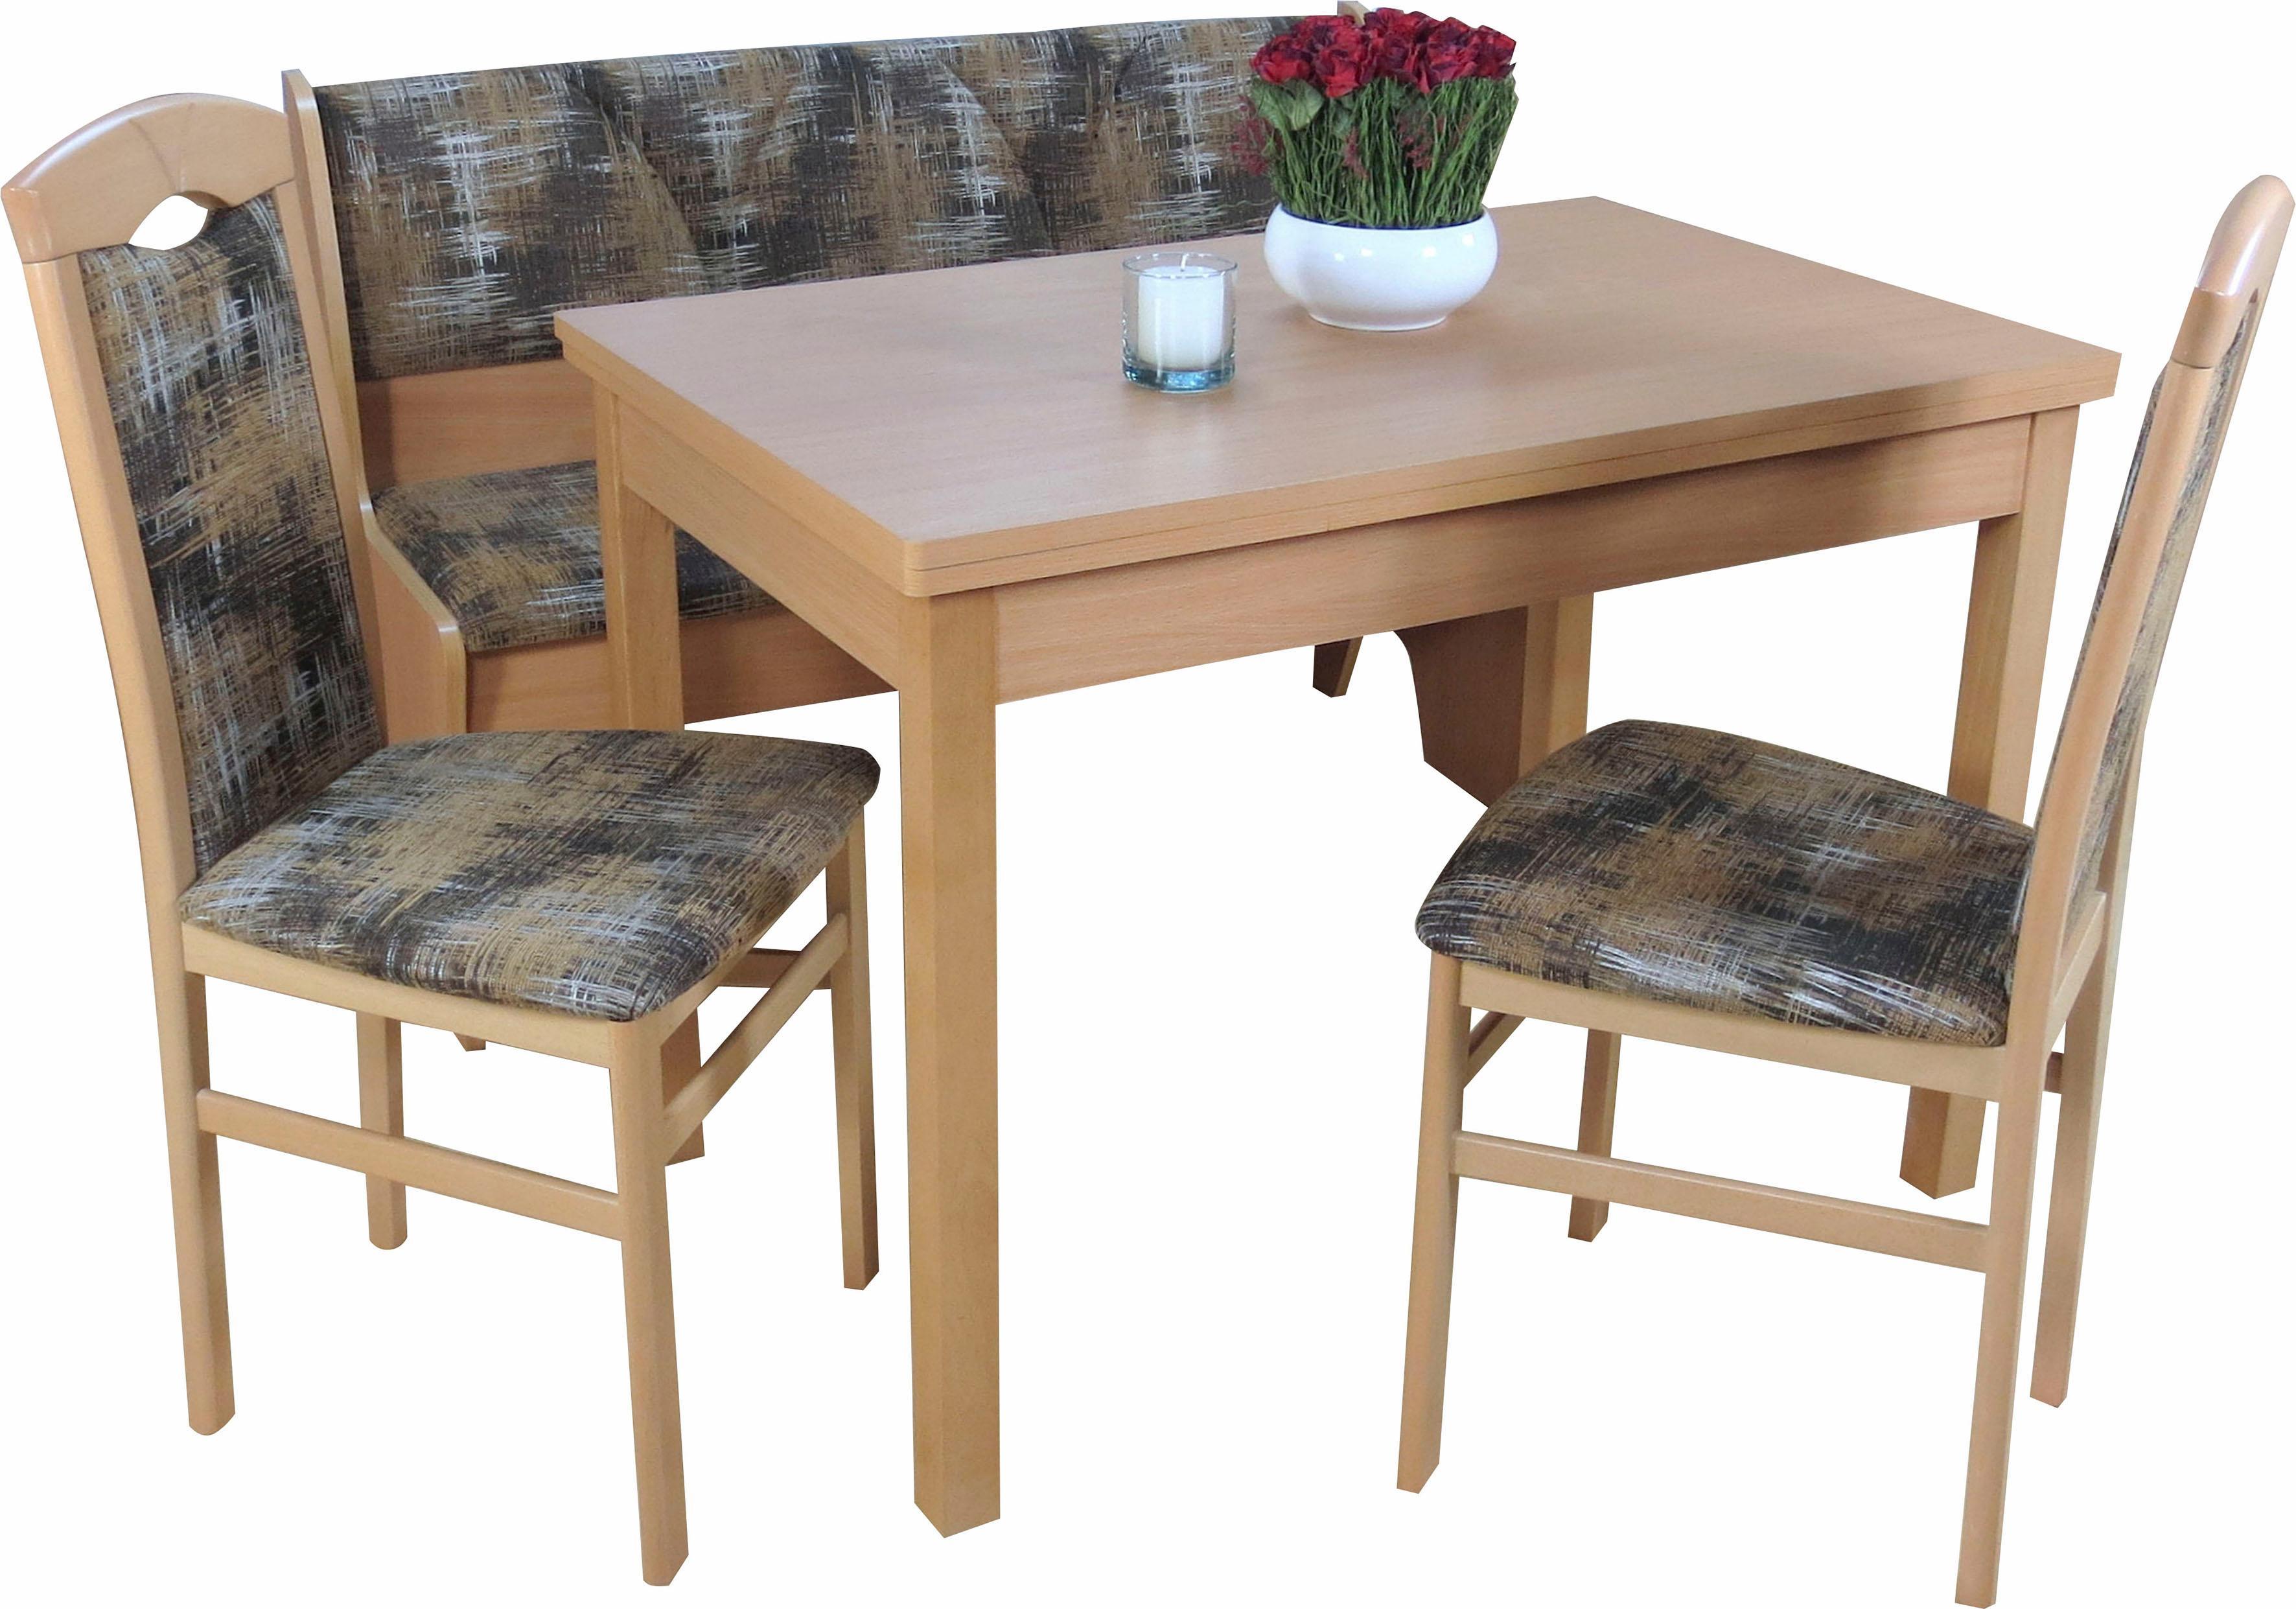 Sitzgruppe mit Truhenbank (4-tlg) | Küche und Esszimmer > Sitzbänke > Truhenbänke | Buchenholz - Stoff - Buche - Massivholz - Melamin - Strukturstoff - Abs